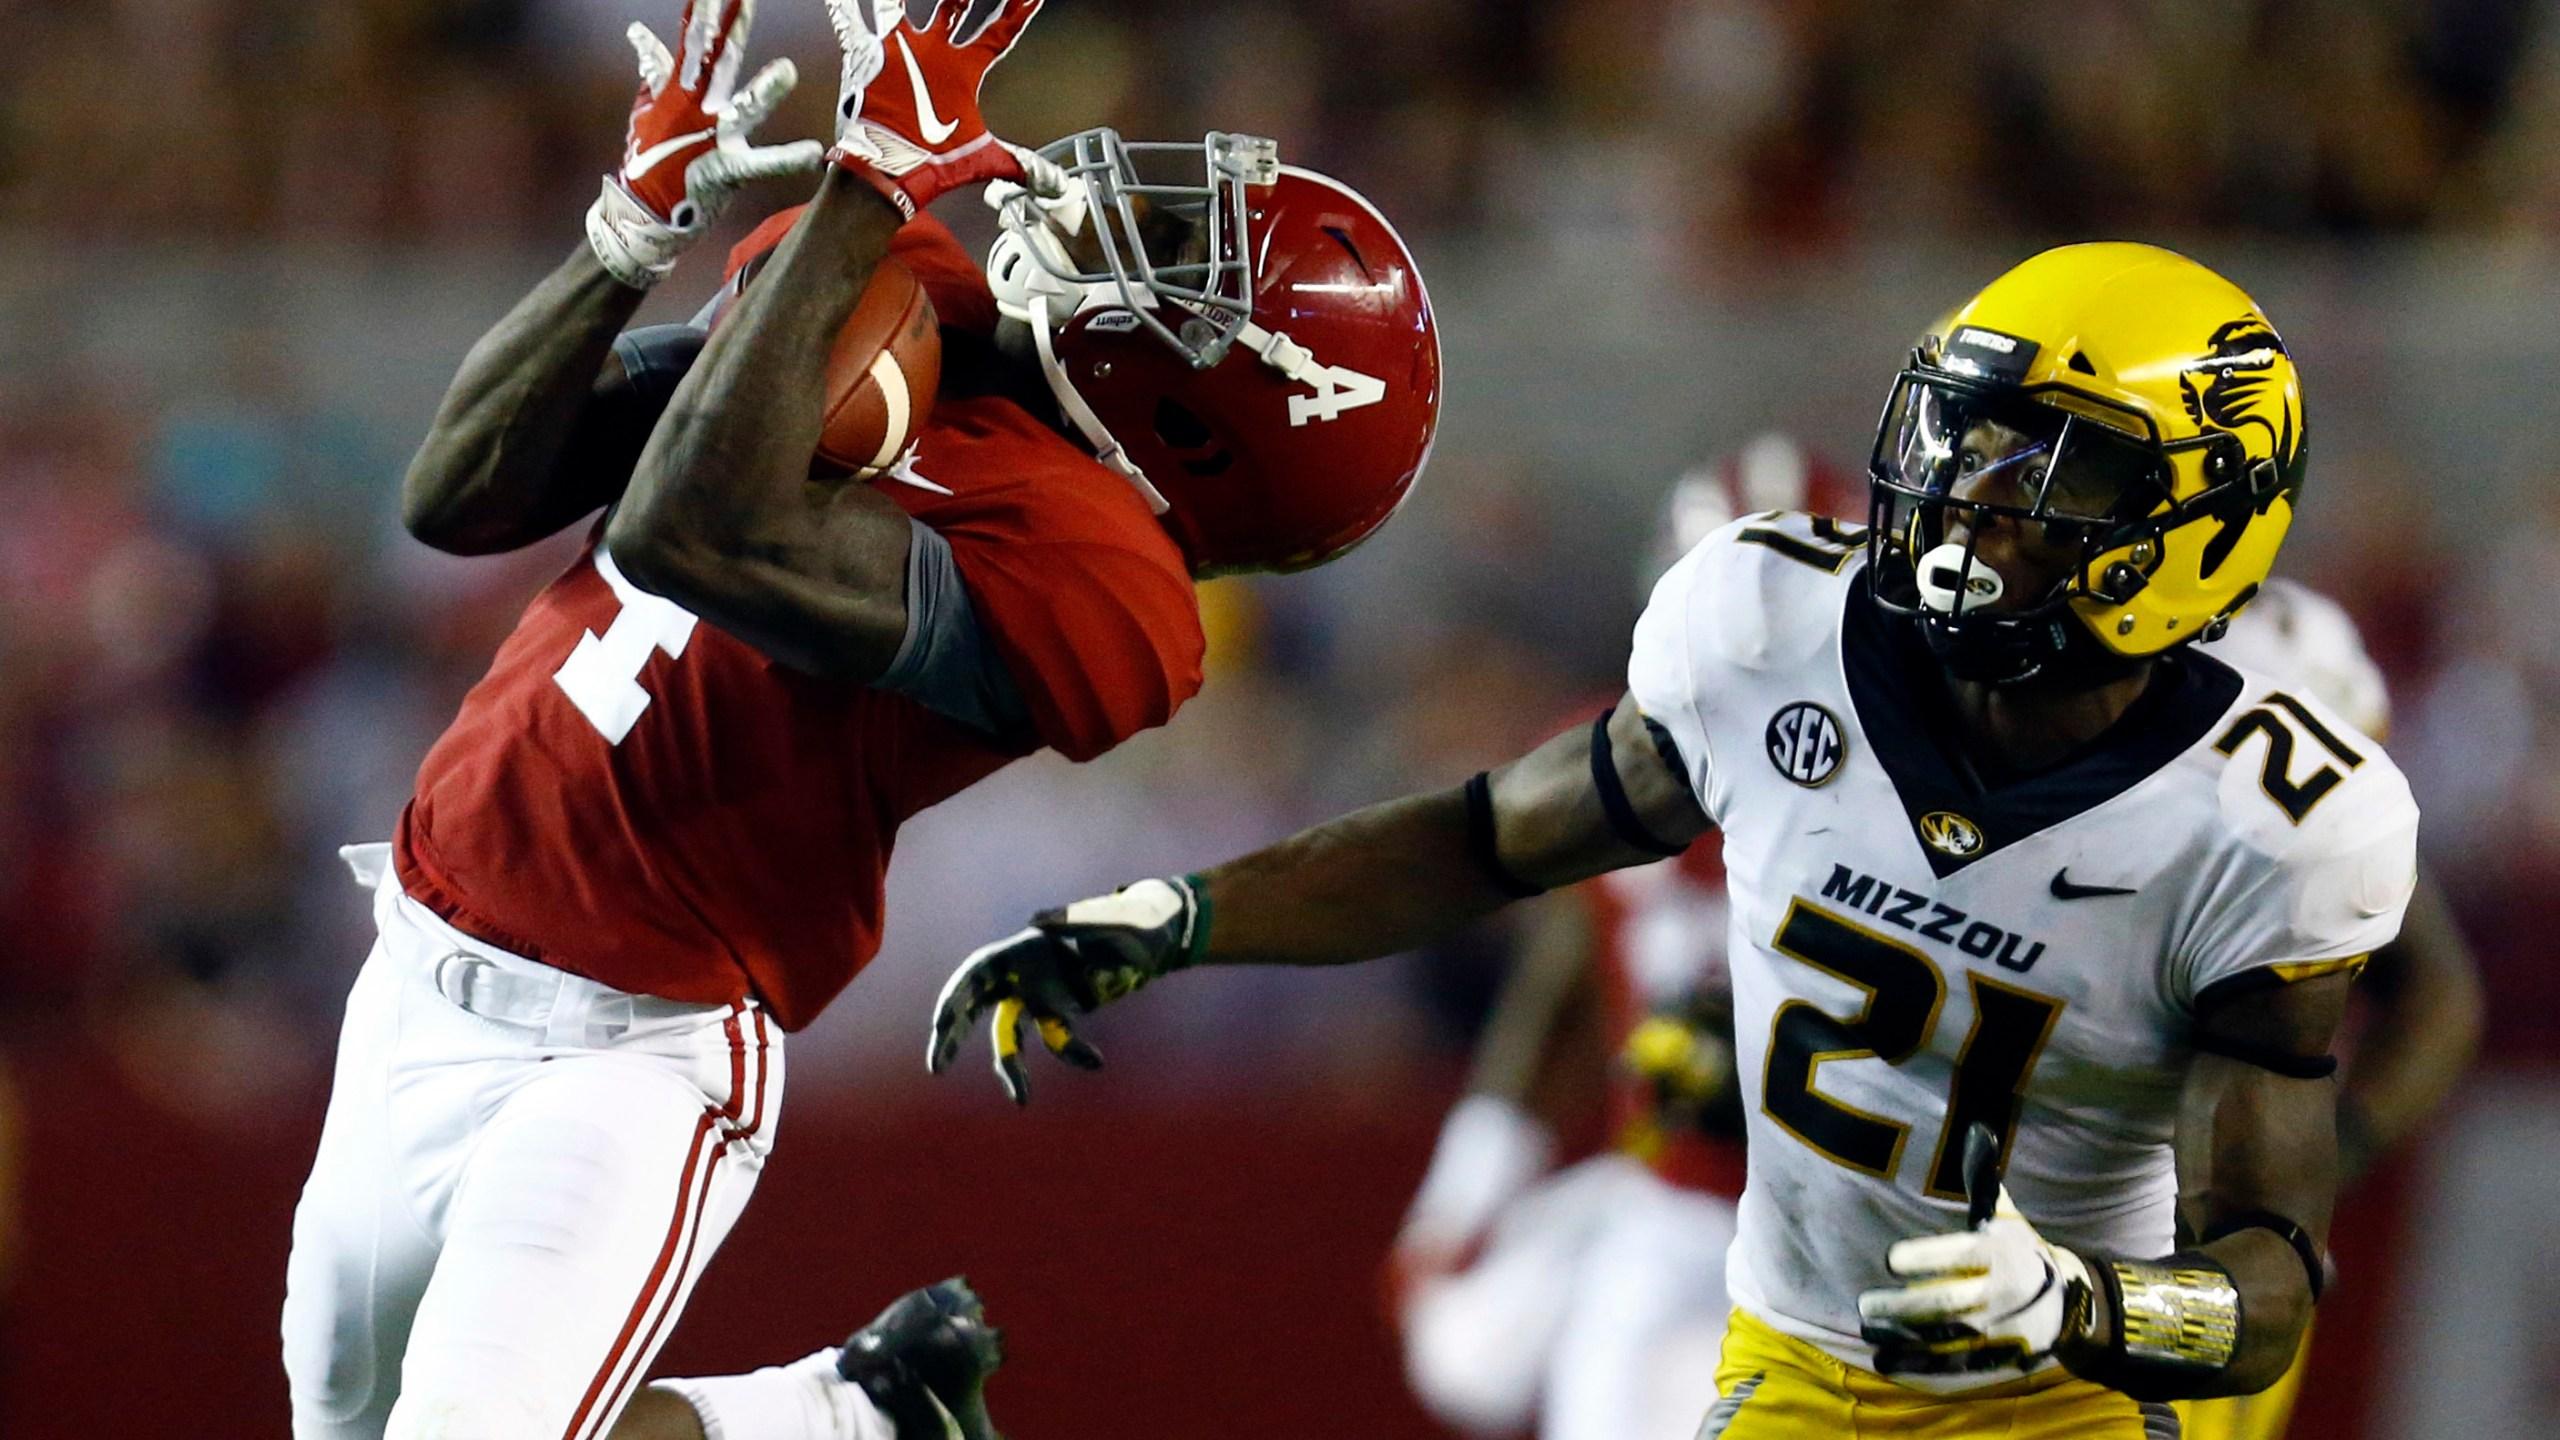 APTOPIX_Missouri_Alabama_Football_48971-159532.jpg16990135